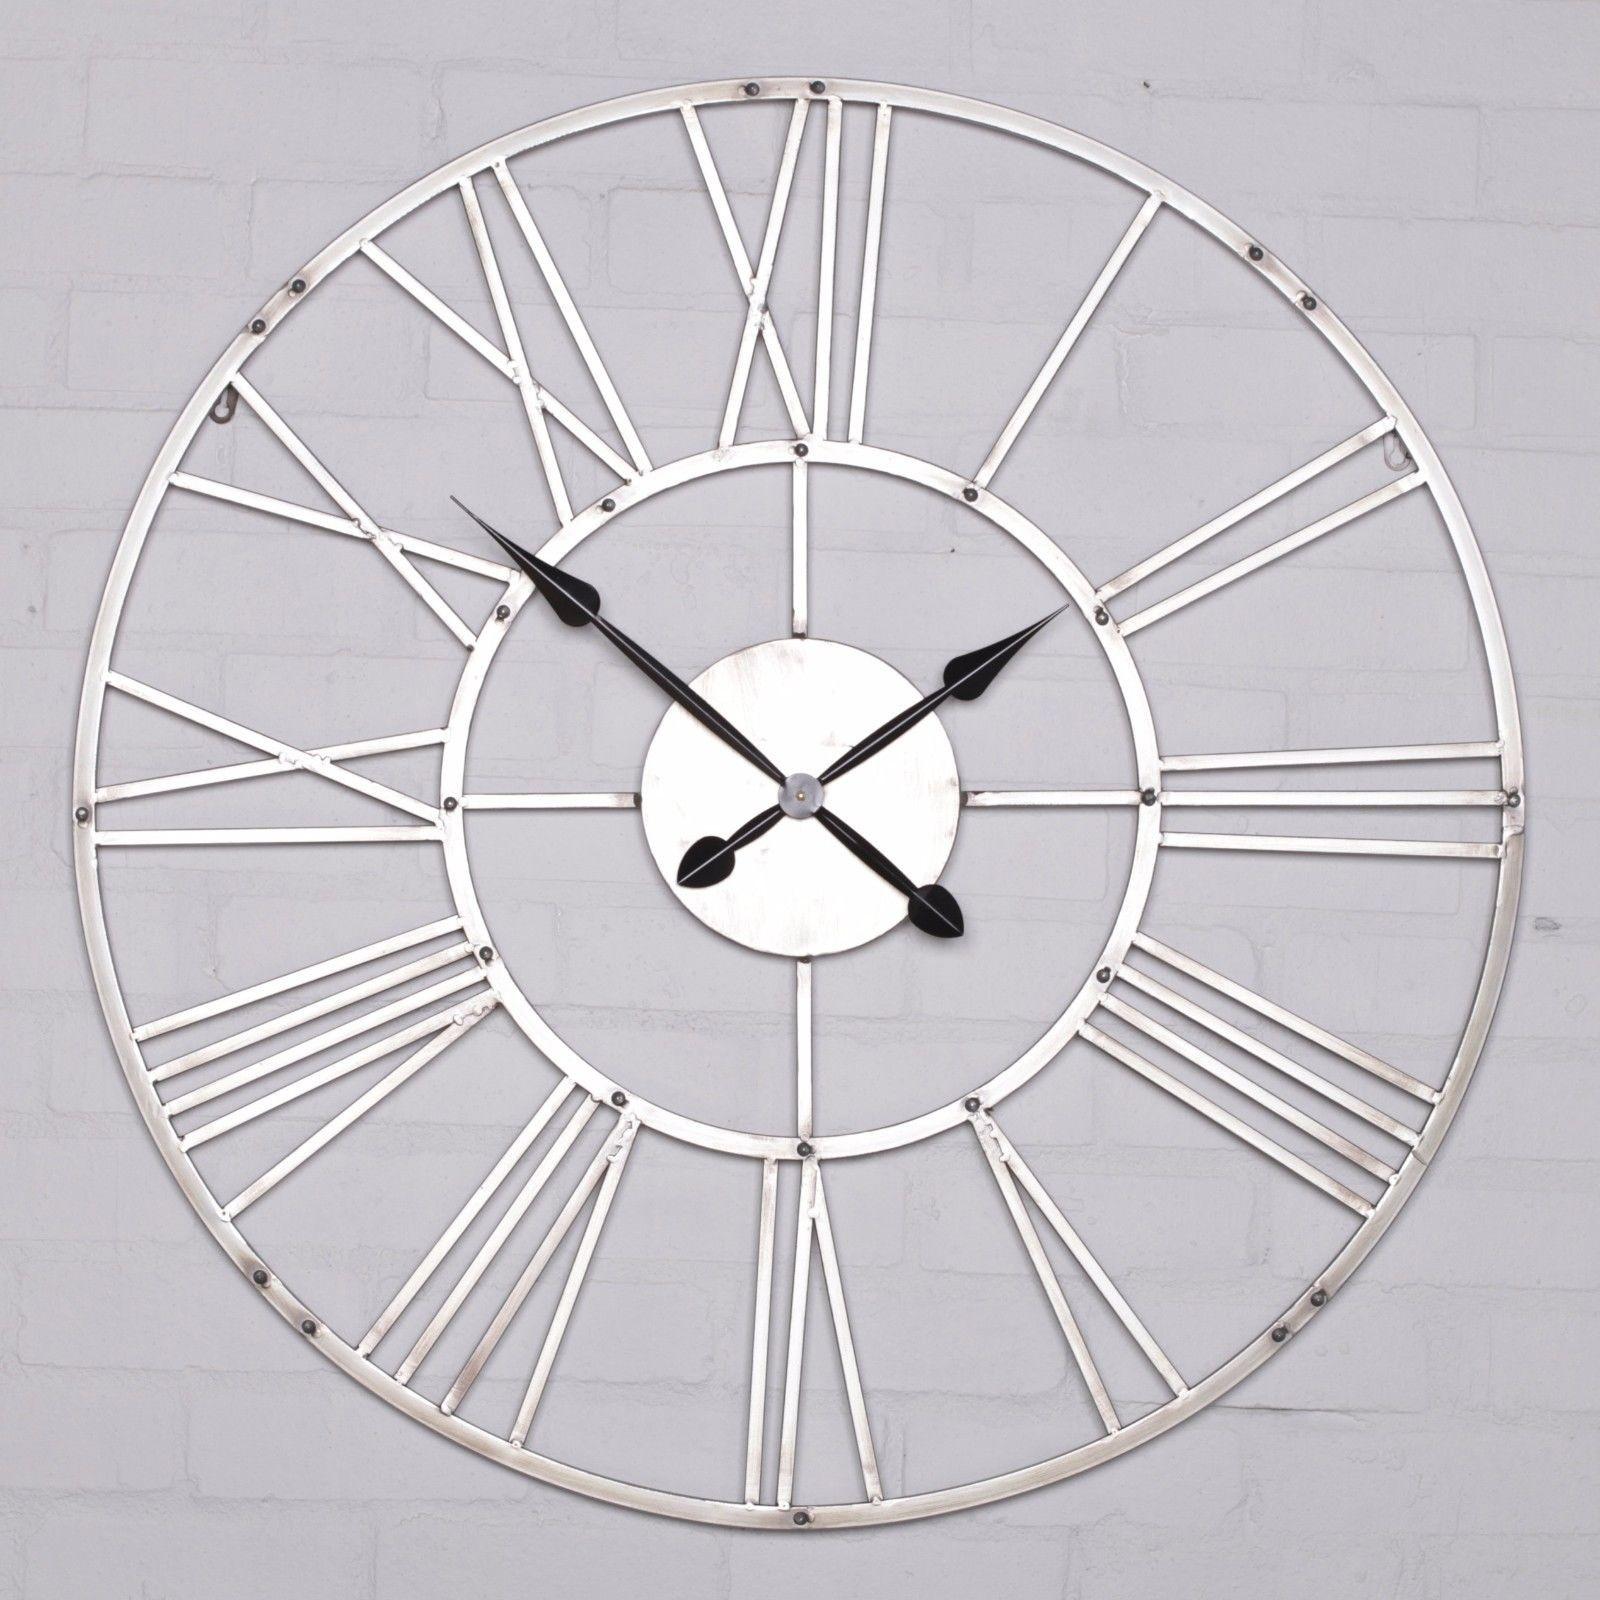 Aged Silver Metal Wall Clock Furniture